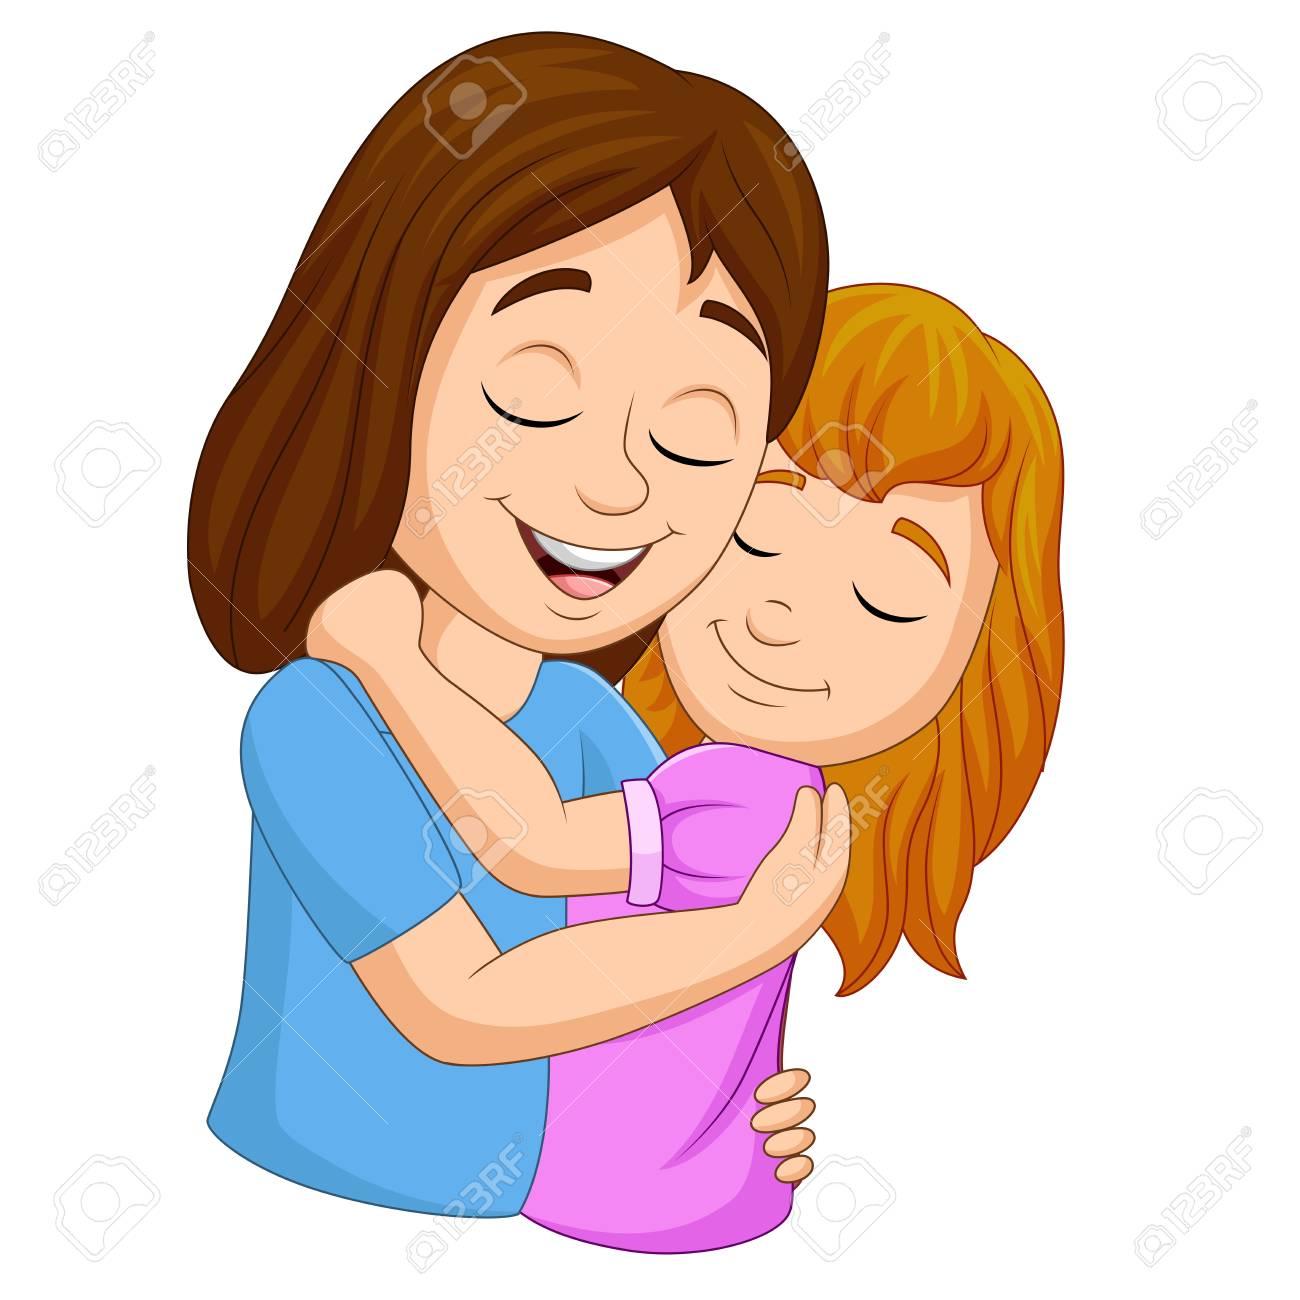 Vector illustration of Cartoon happy mother hugging her daughter - 120324763